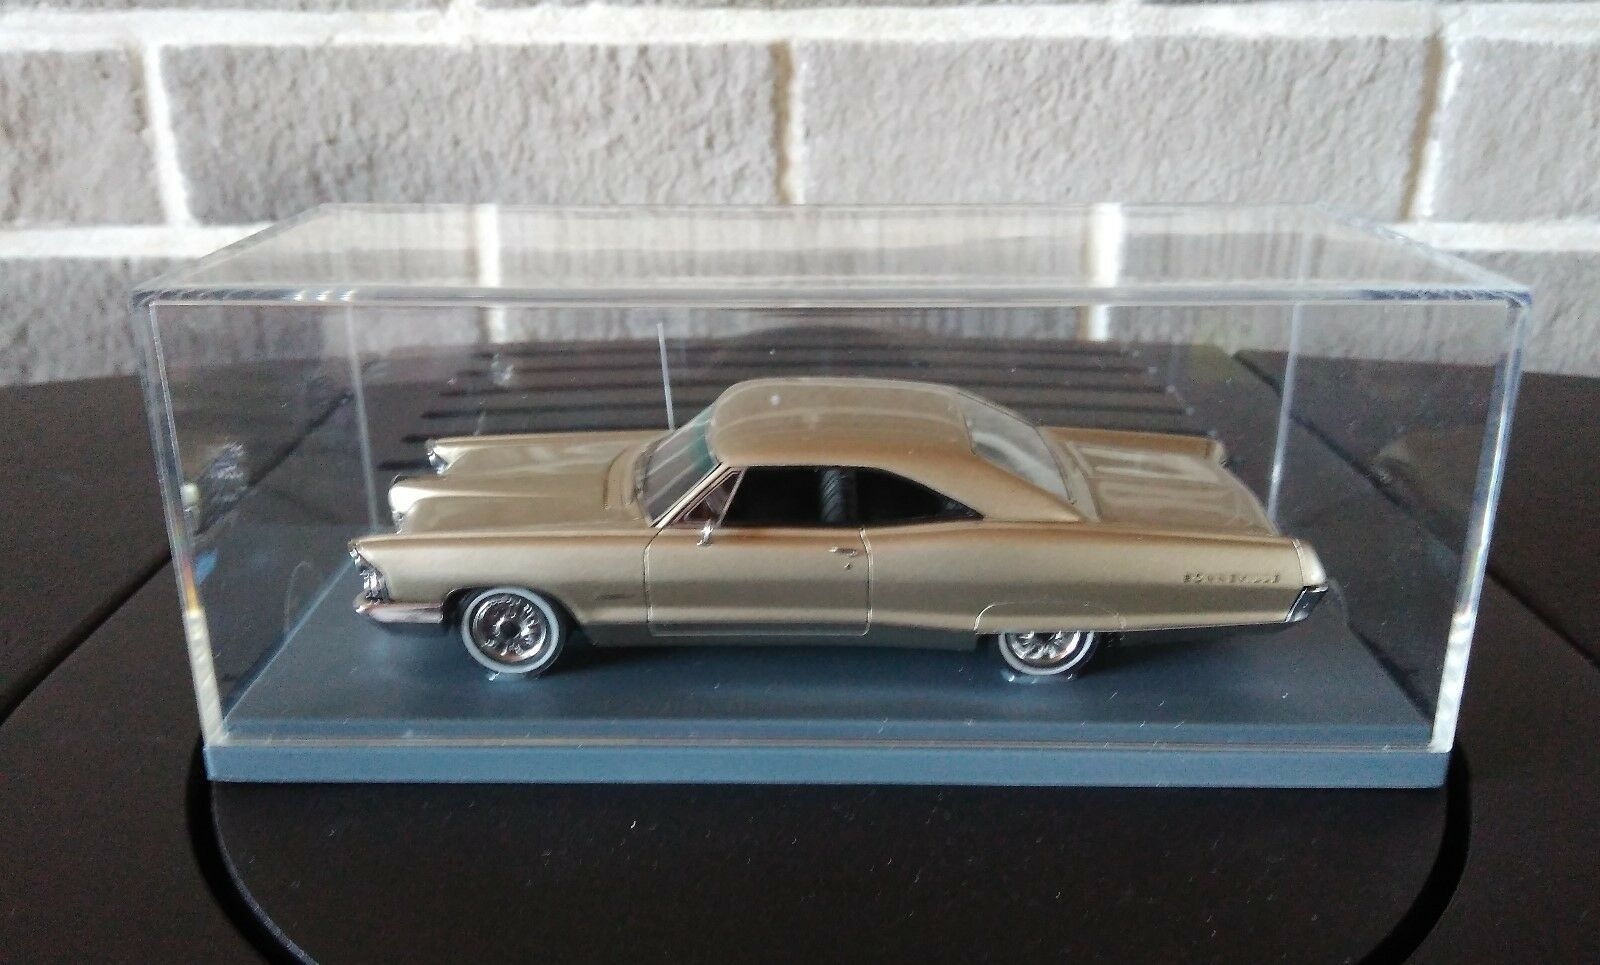 Promo American Excellence 1 43 -Pontiac Bonneville HT Coup 65533;(begränsad Ed.500Ex)